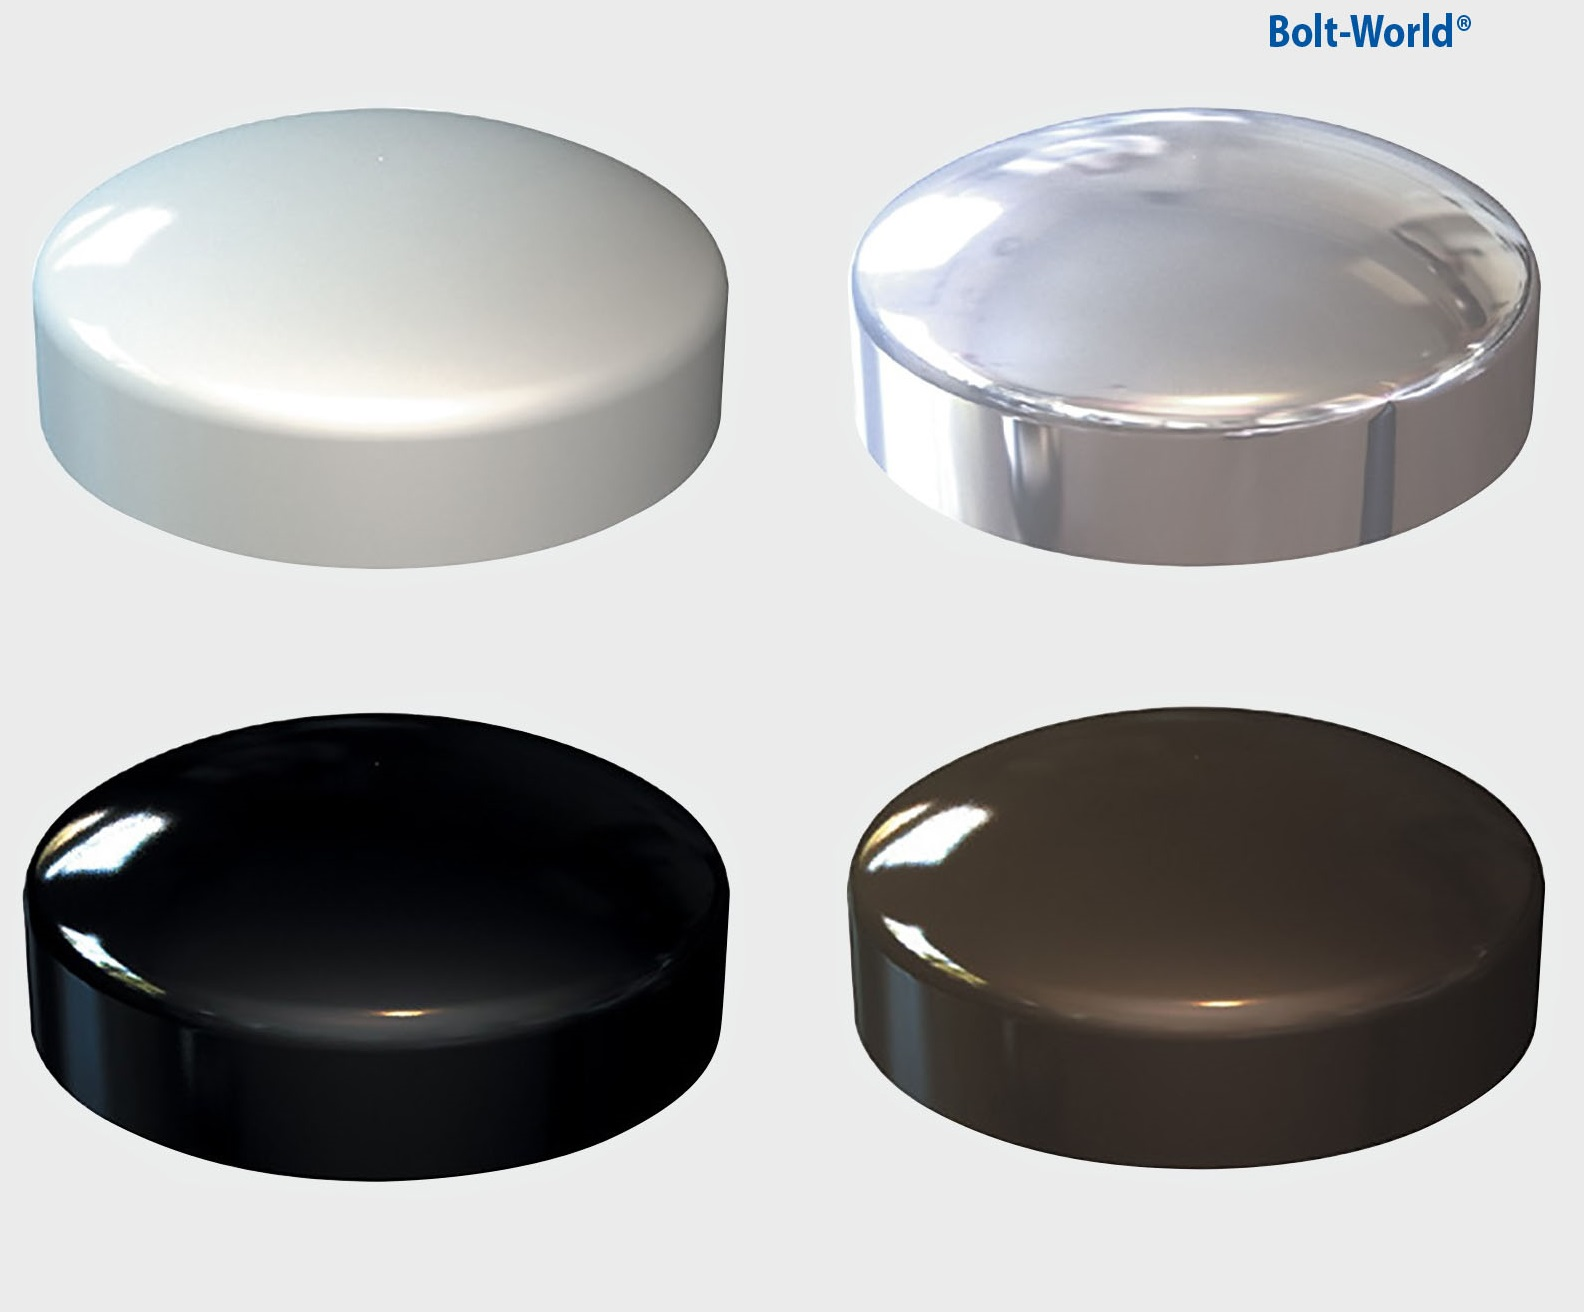 plastic dome screw cover cap chrome white black brown. Black Bedroom Furniture Sets. Home Design Ideas